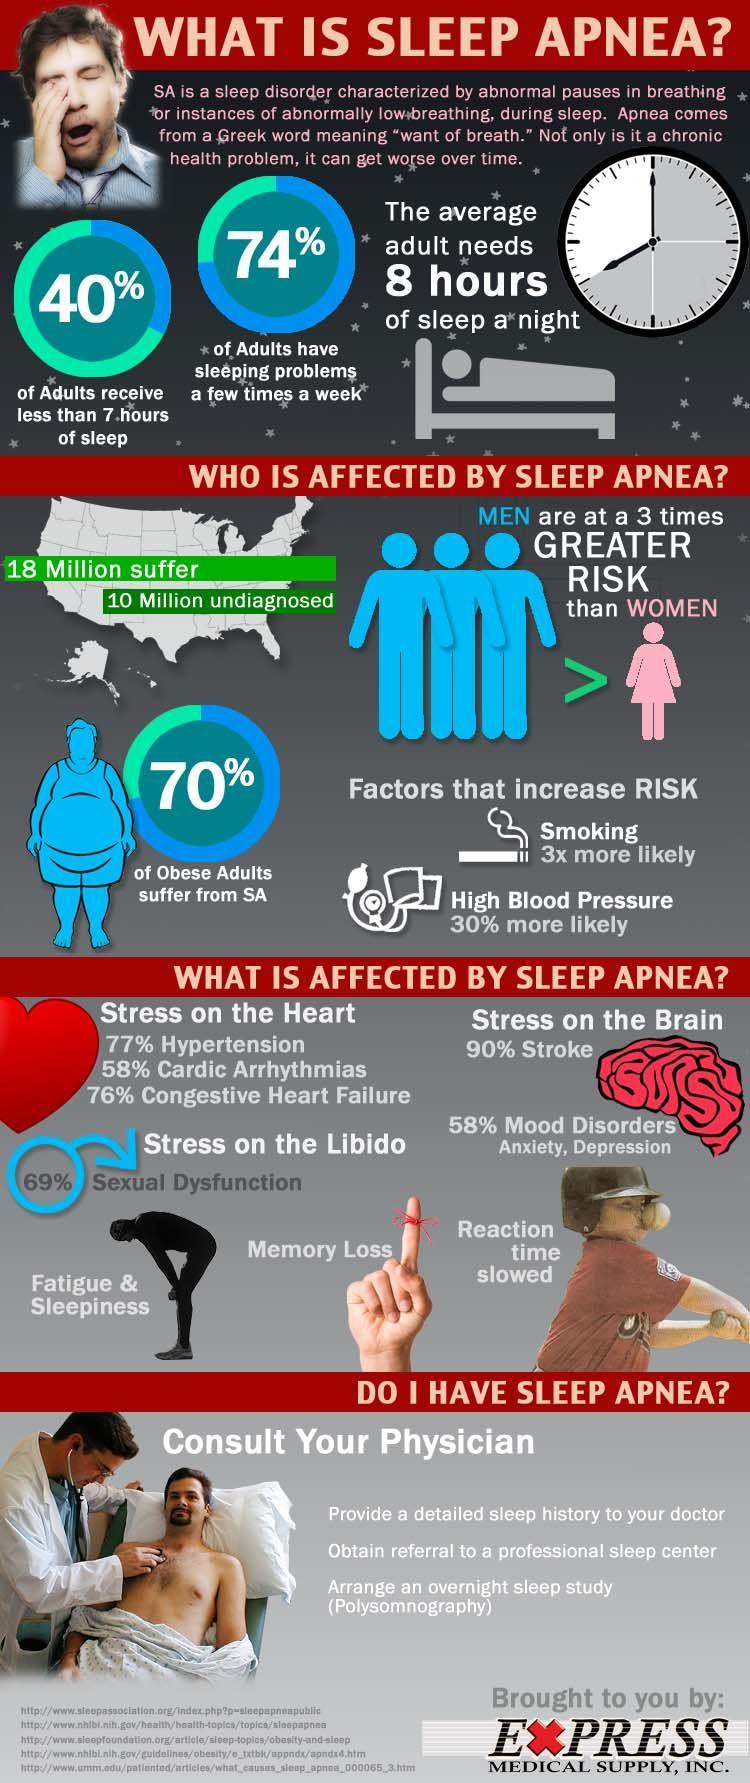 Express medical supply blog what is sleep apnea sleep